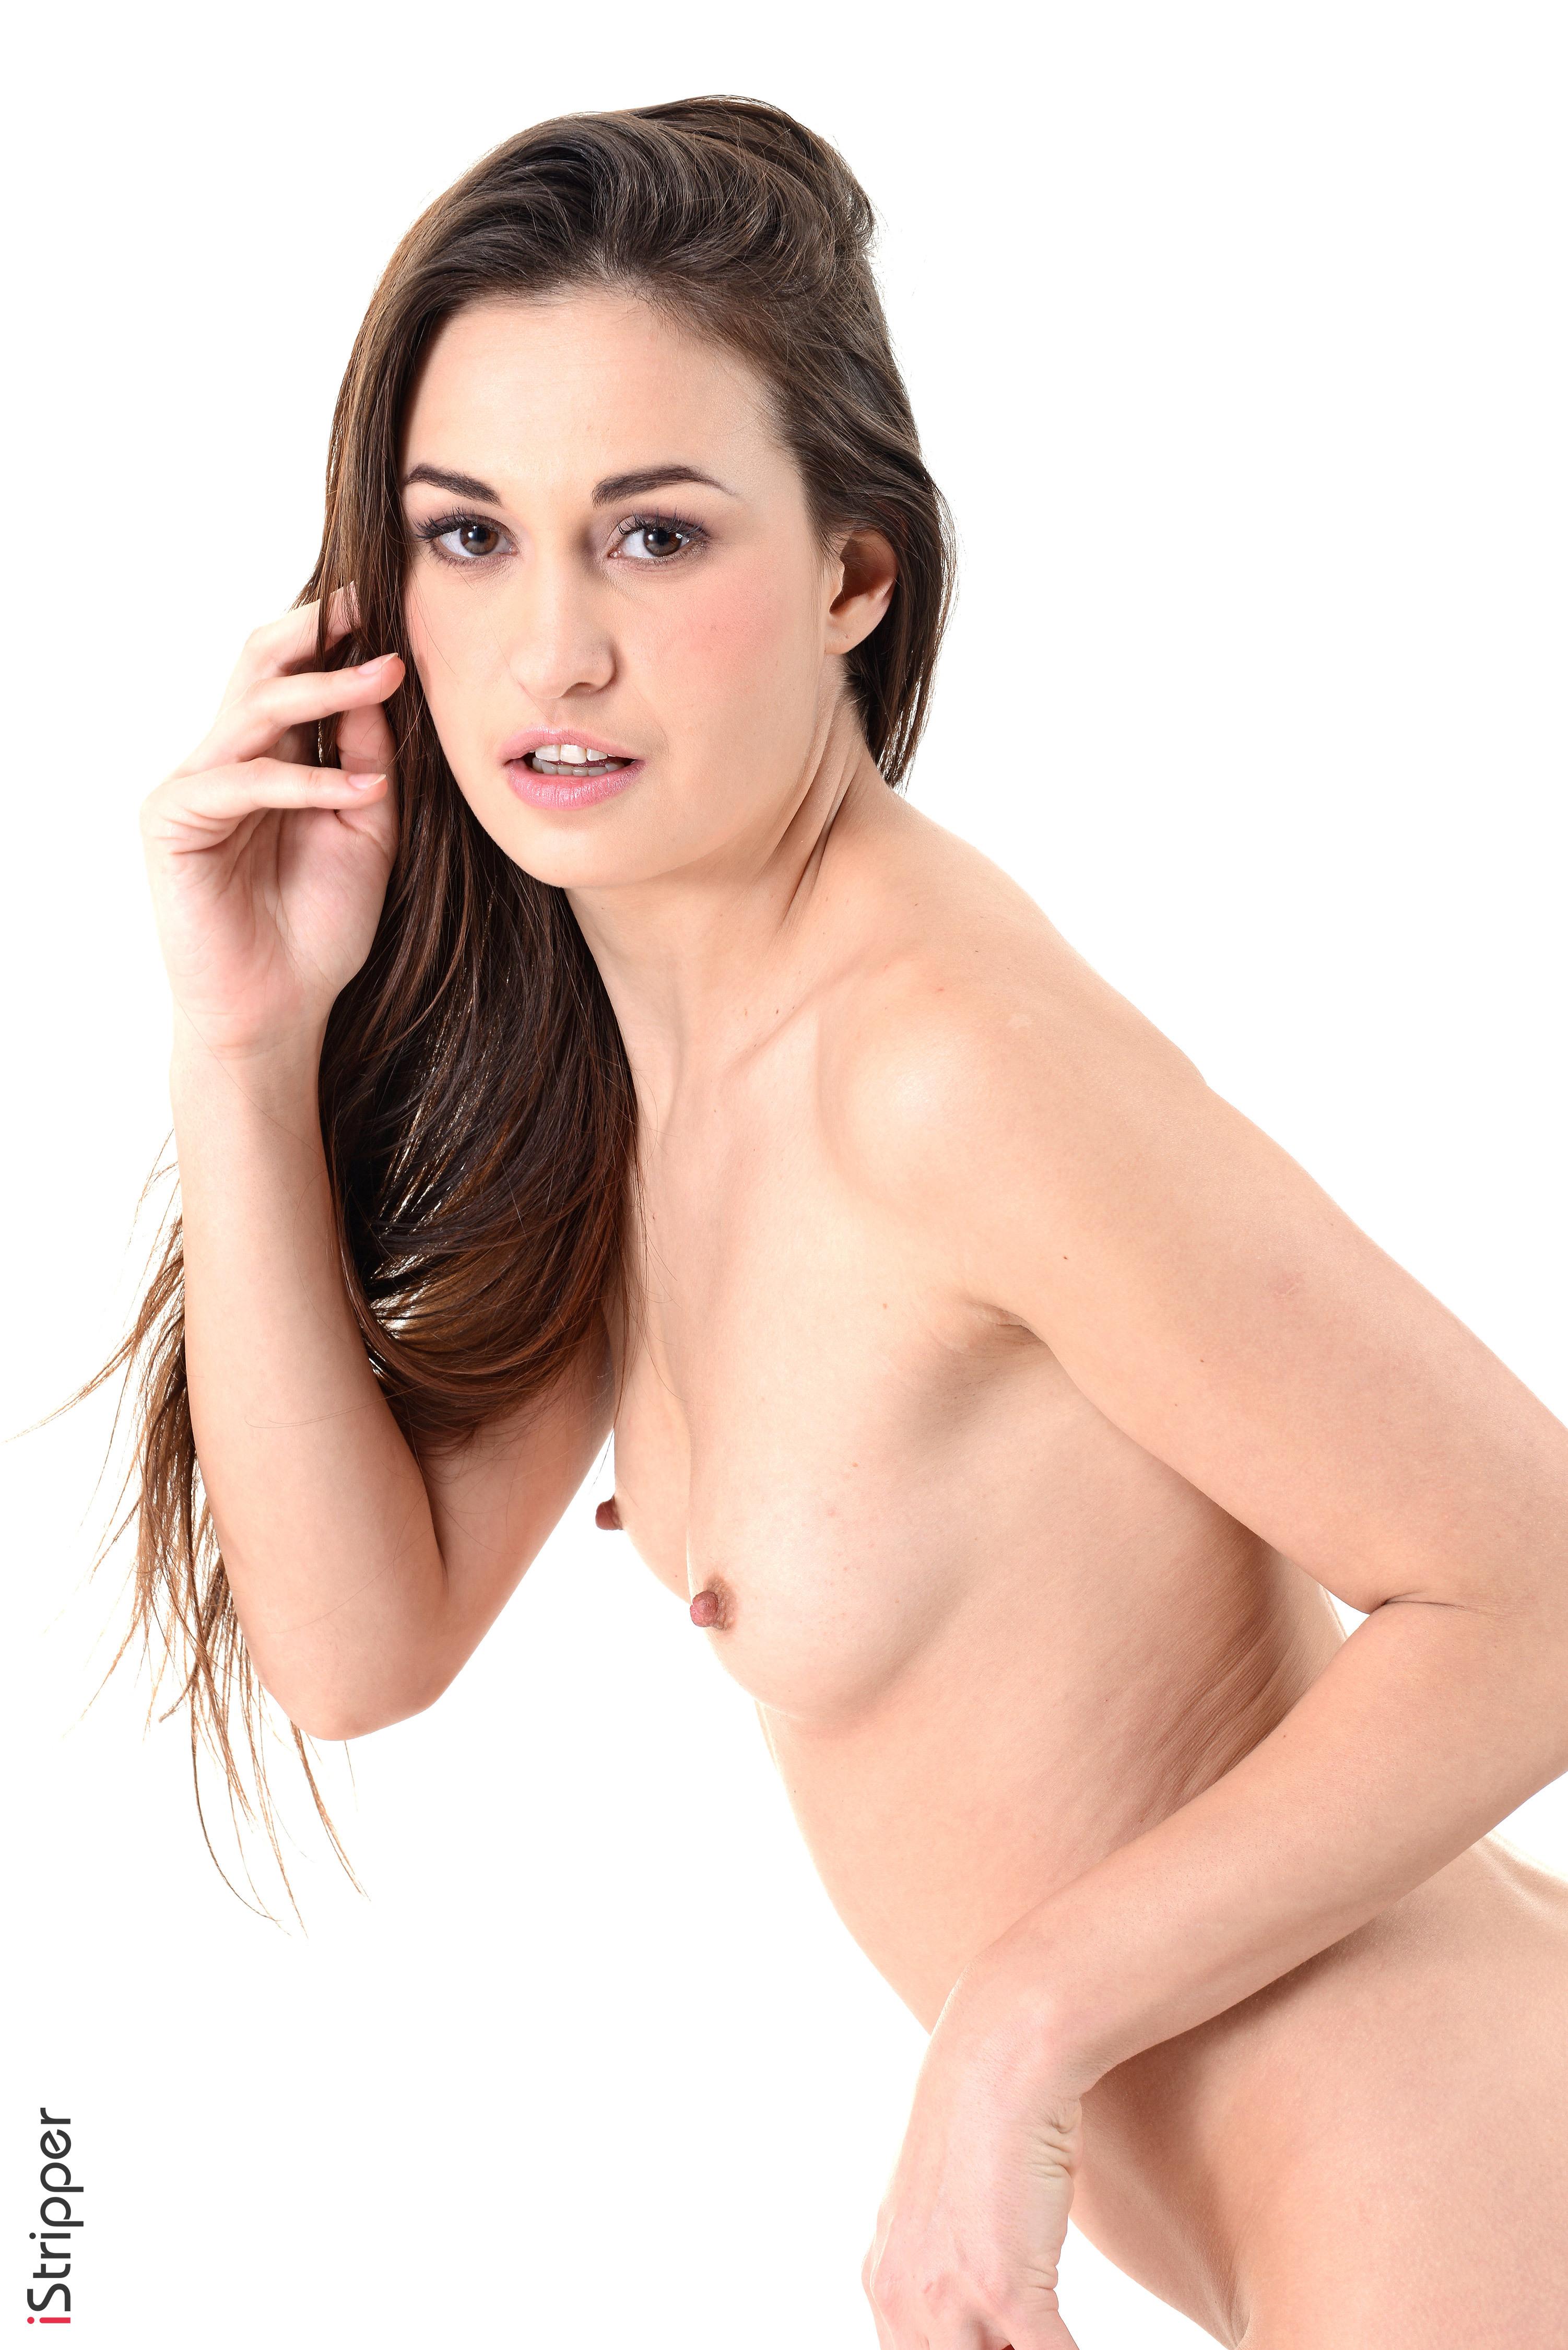 alice goodwin nude wallpaper